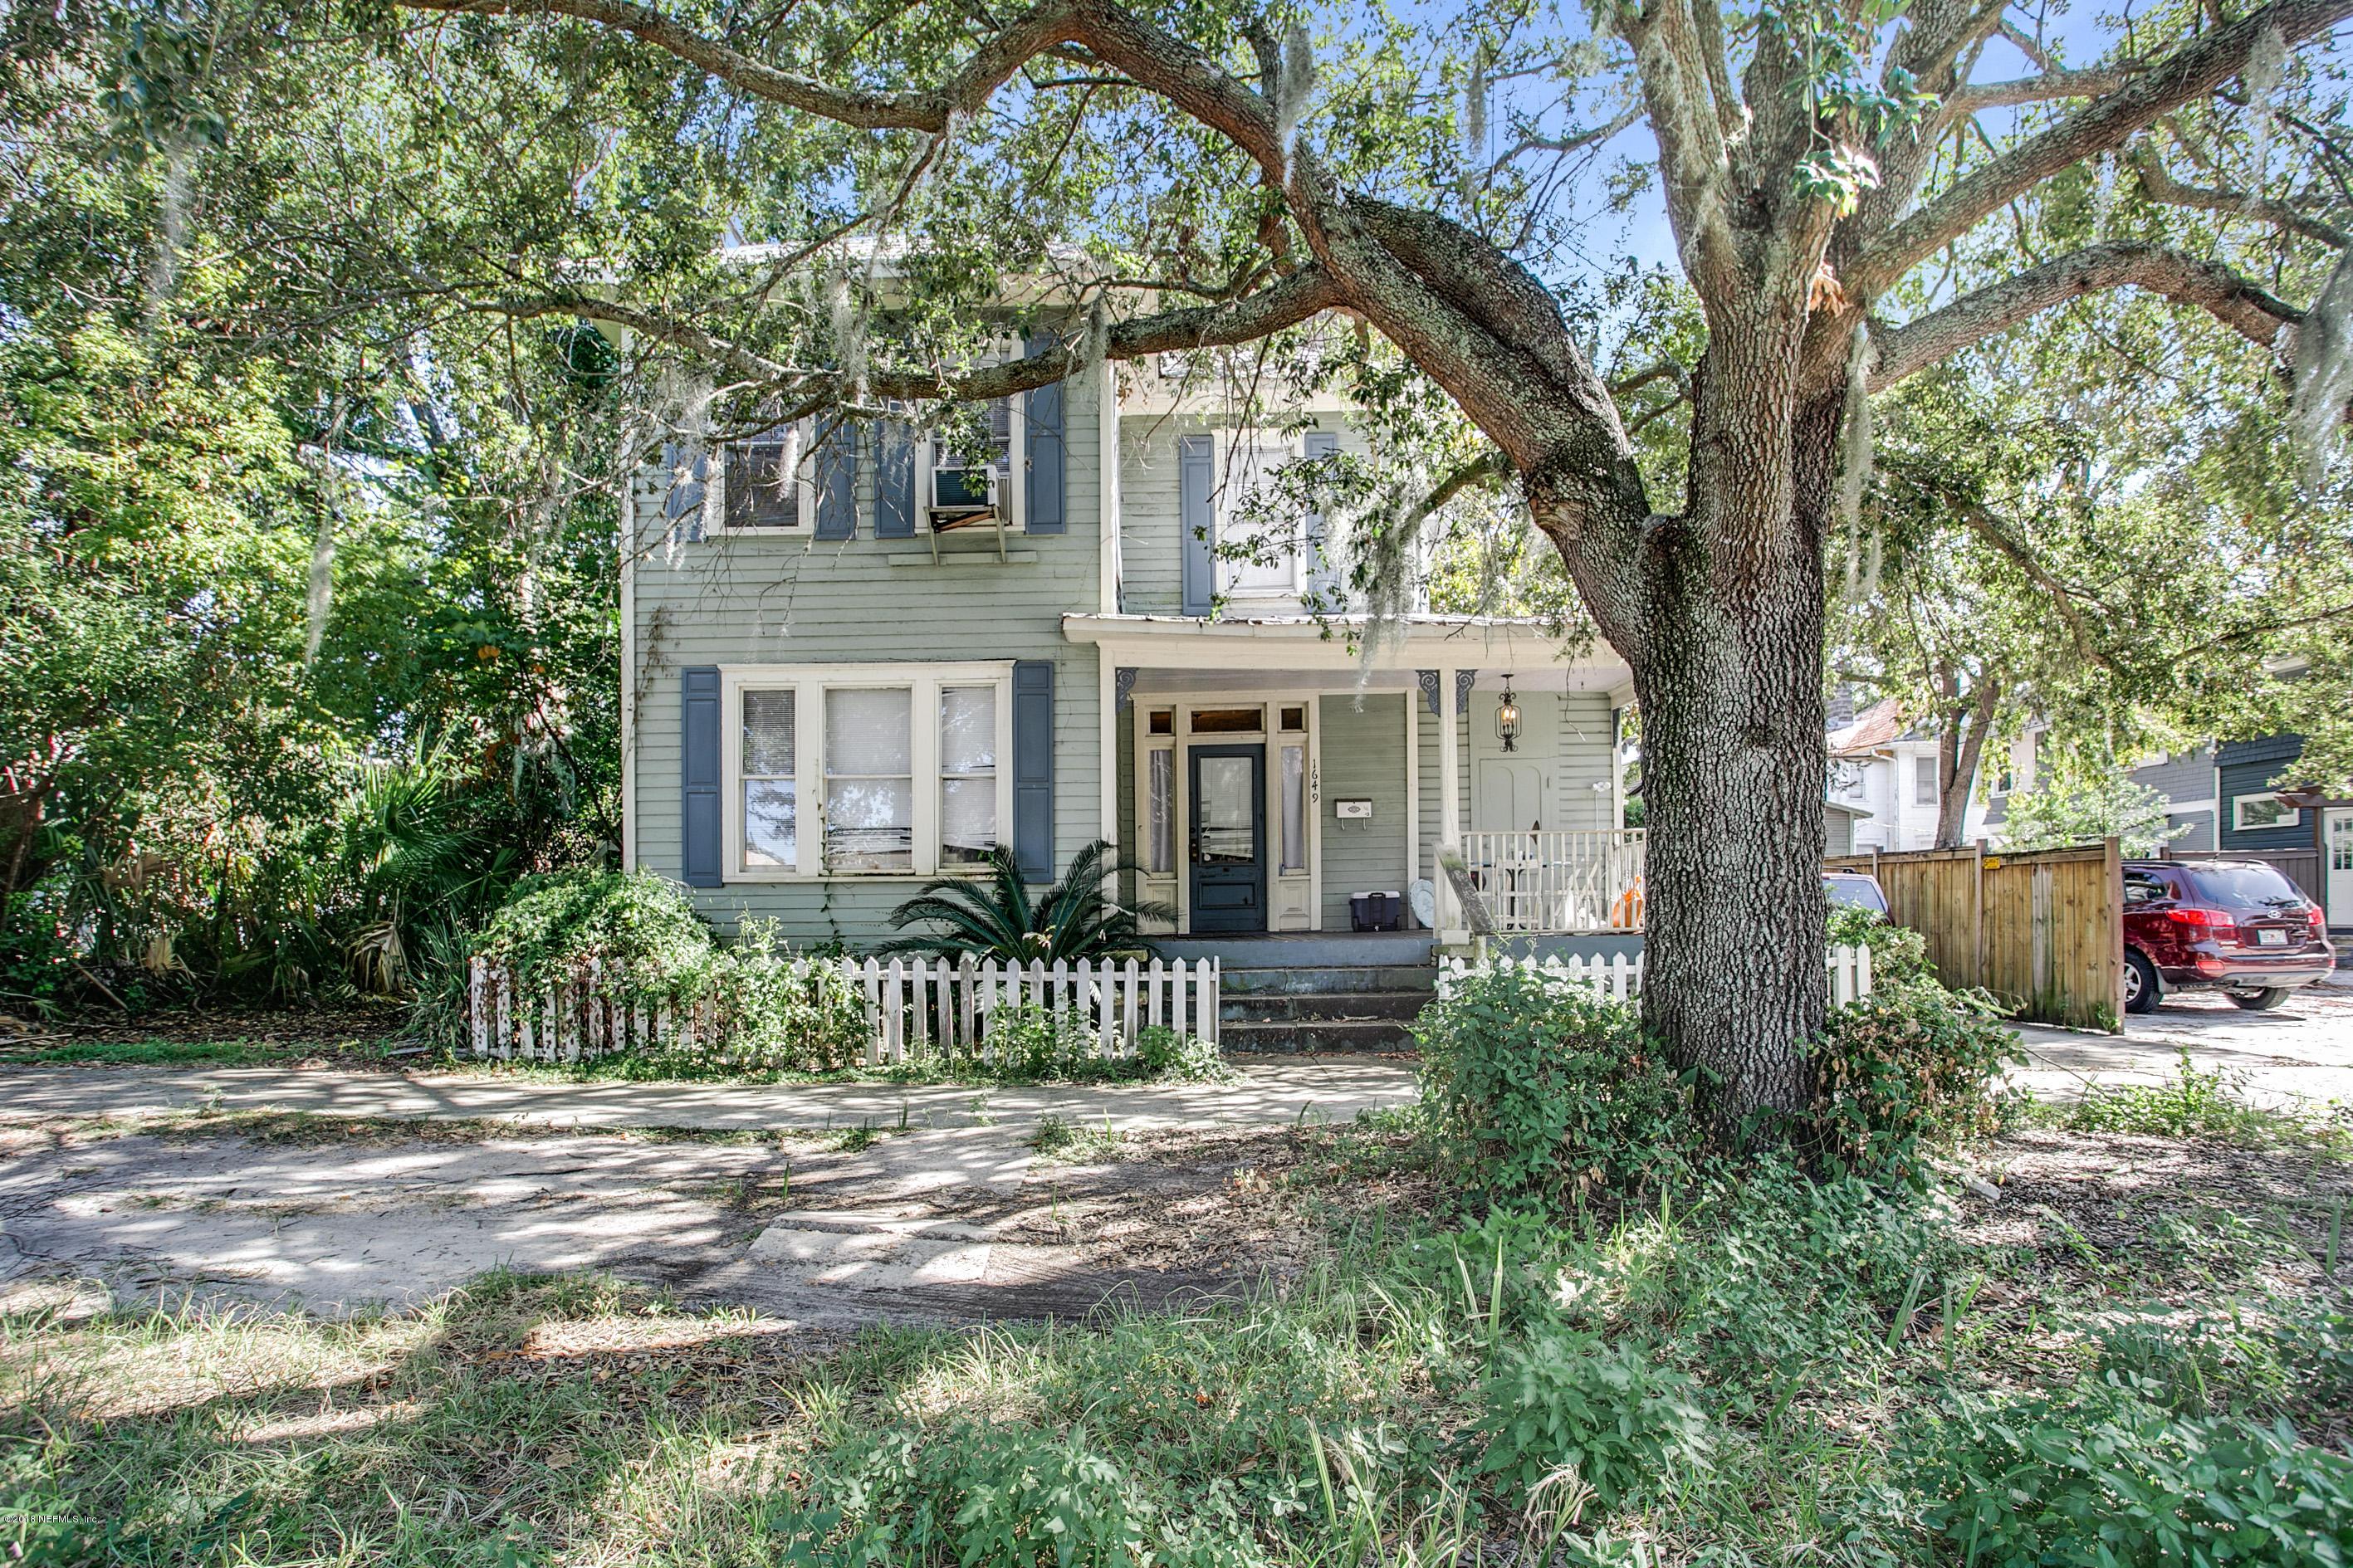 1649 STOCKTON, JACKSONVILLE, FLORIDA 32204, 4 Bedrooms Bedrooms, ,3 BathroomsBathrooms,Multi family,For sale,STOCKTON,963052